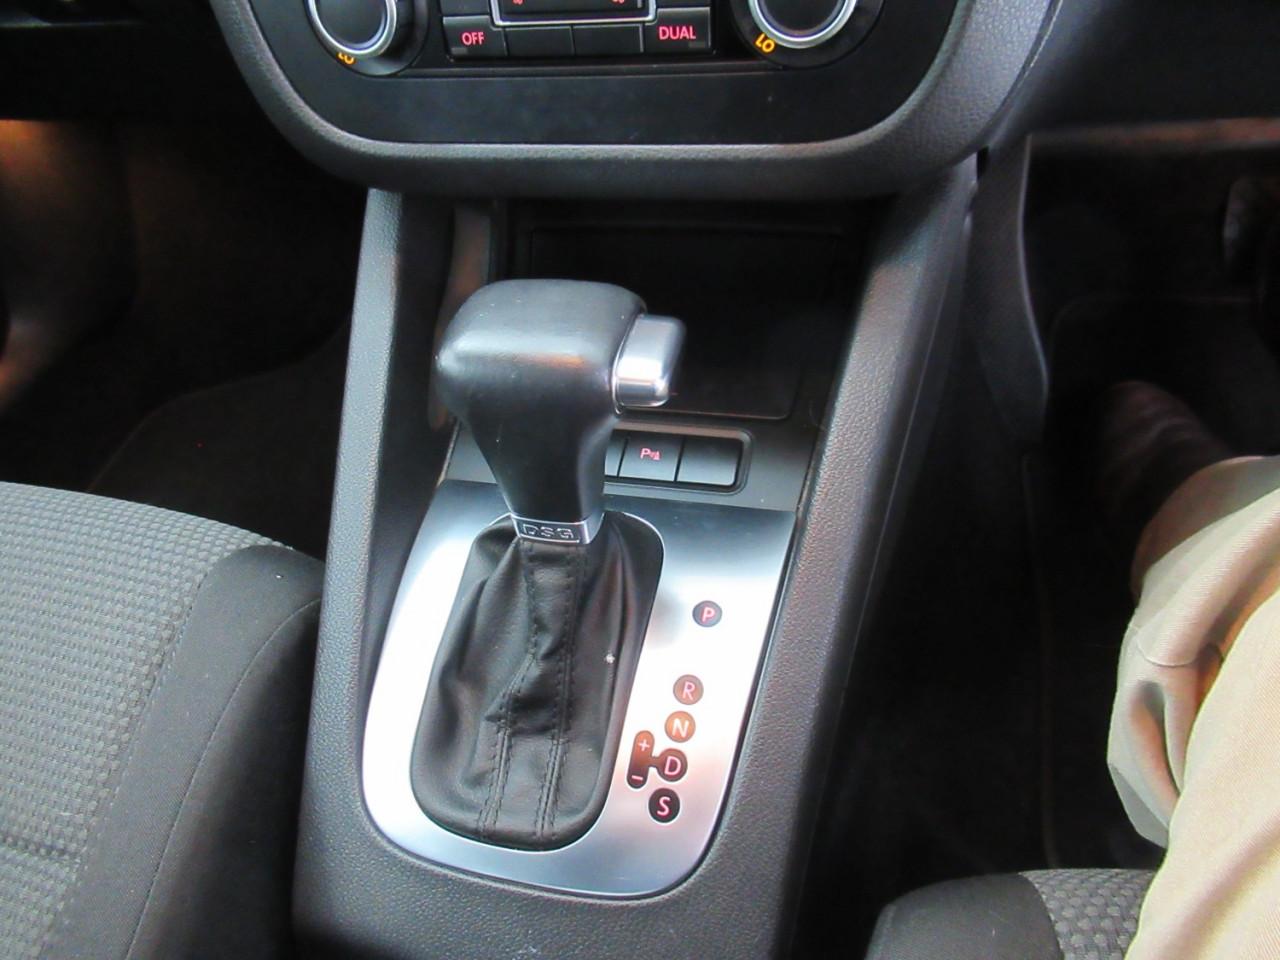 2010 Volkswagen Jetta 1KM MY10 103TDI Sedan Image 22